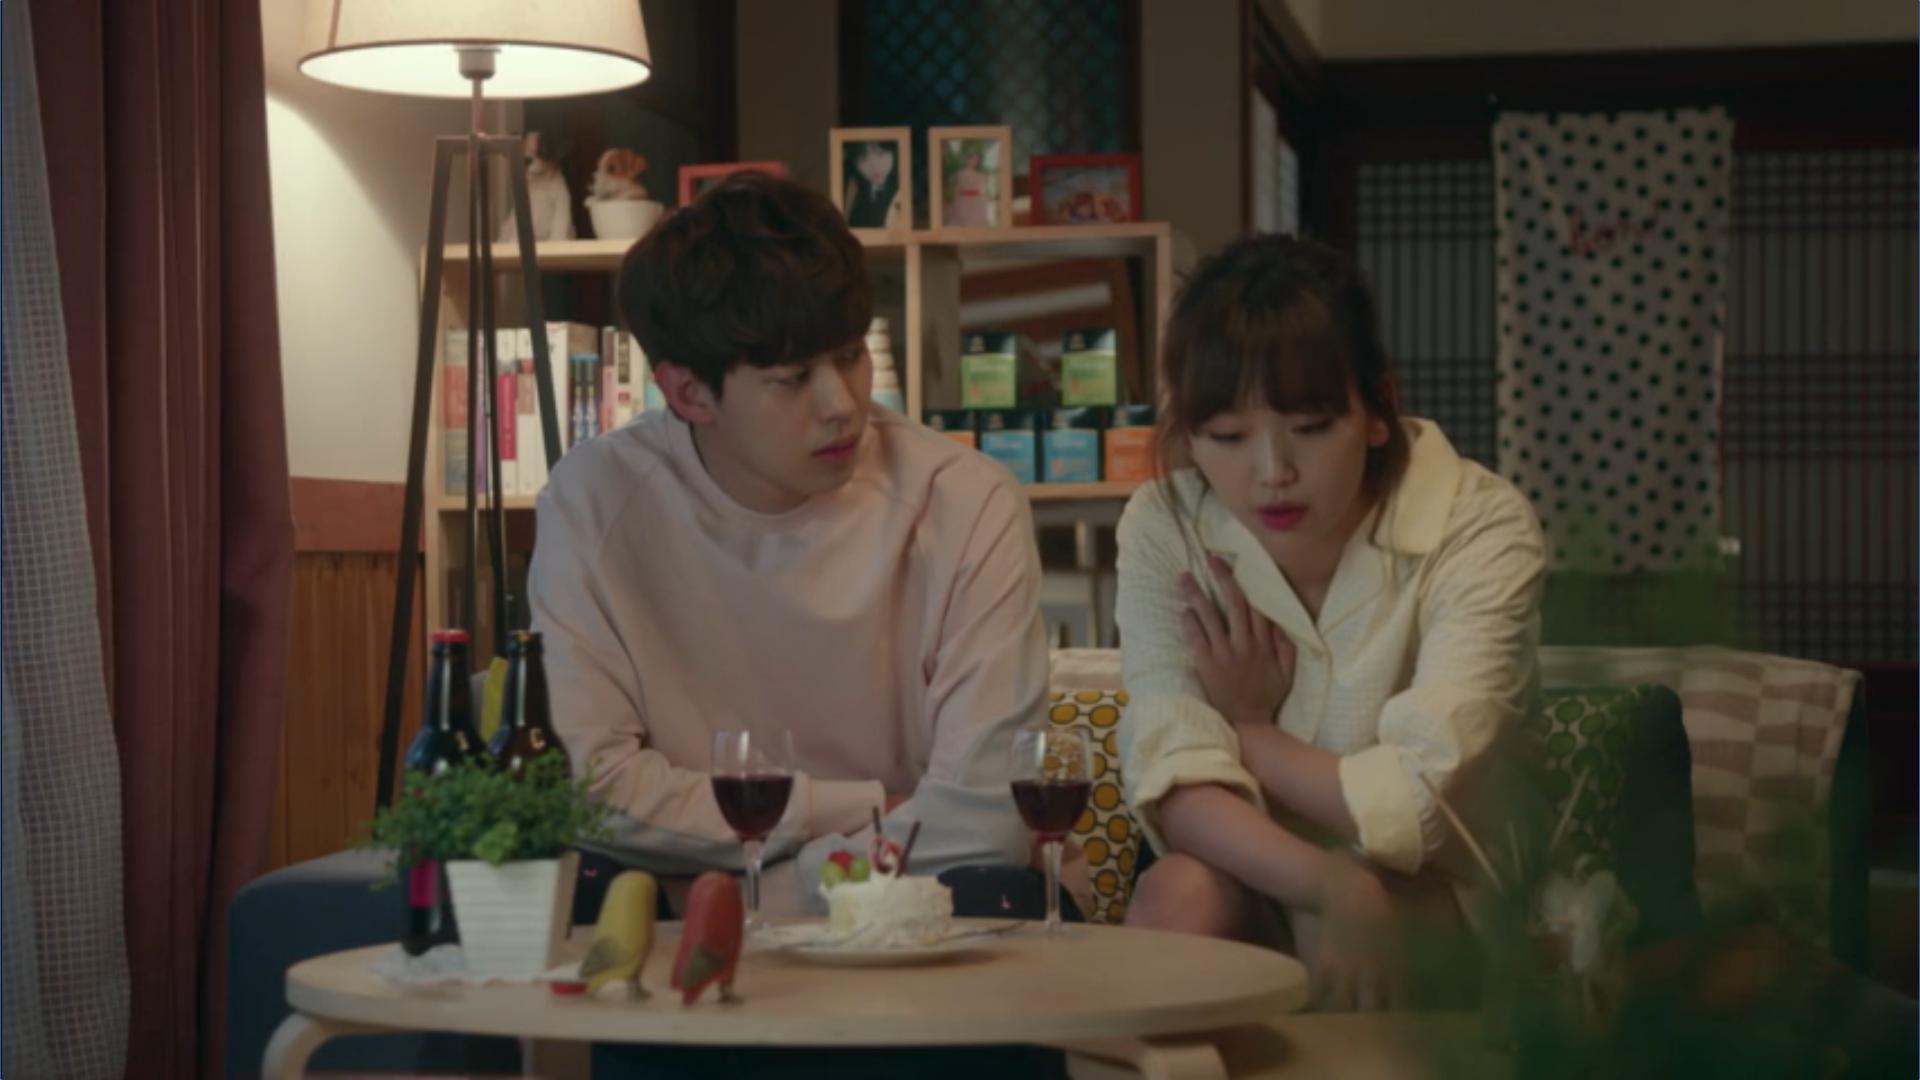 Wednesday 3:30 PM Seon Eun-woo and Yoon Jae-won talking with cake and wine